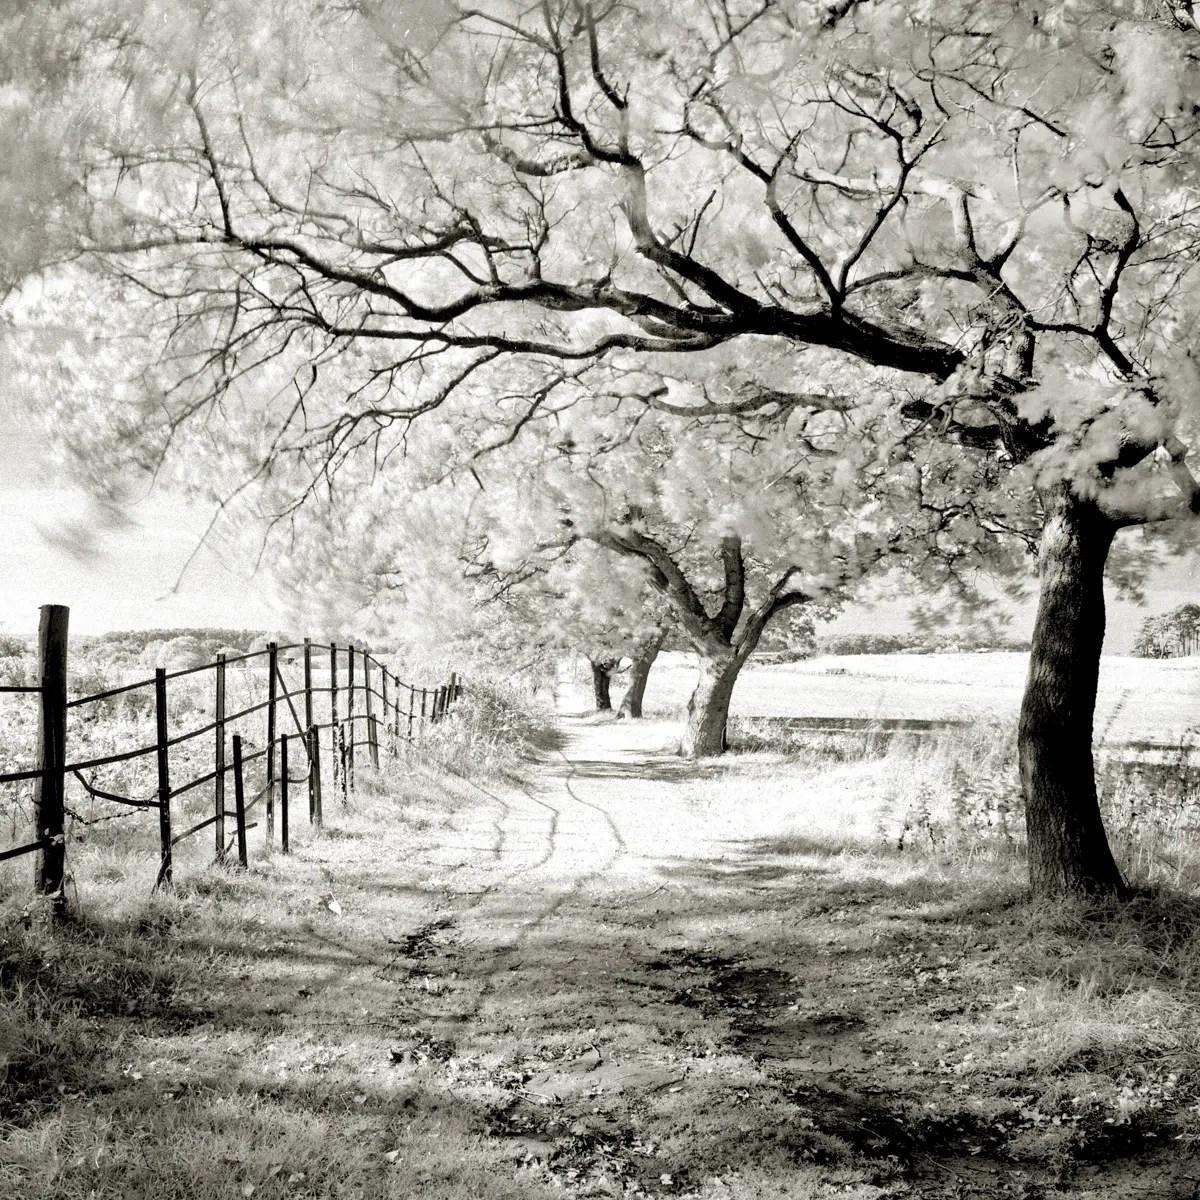 Trees and railings